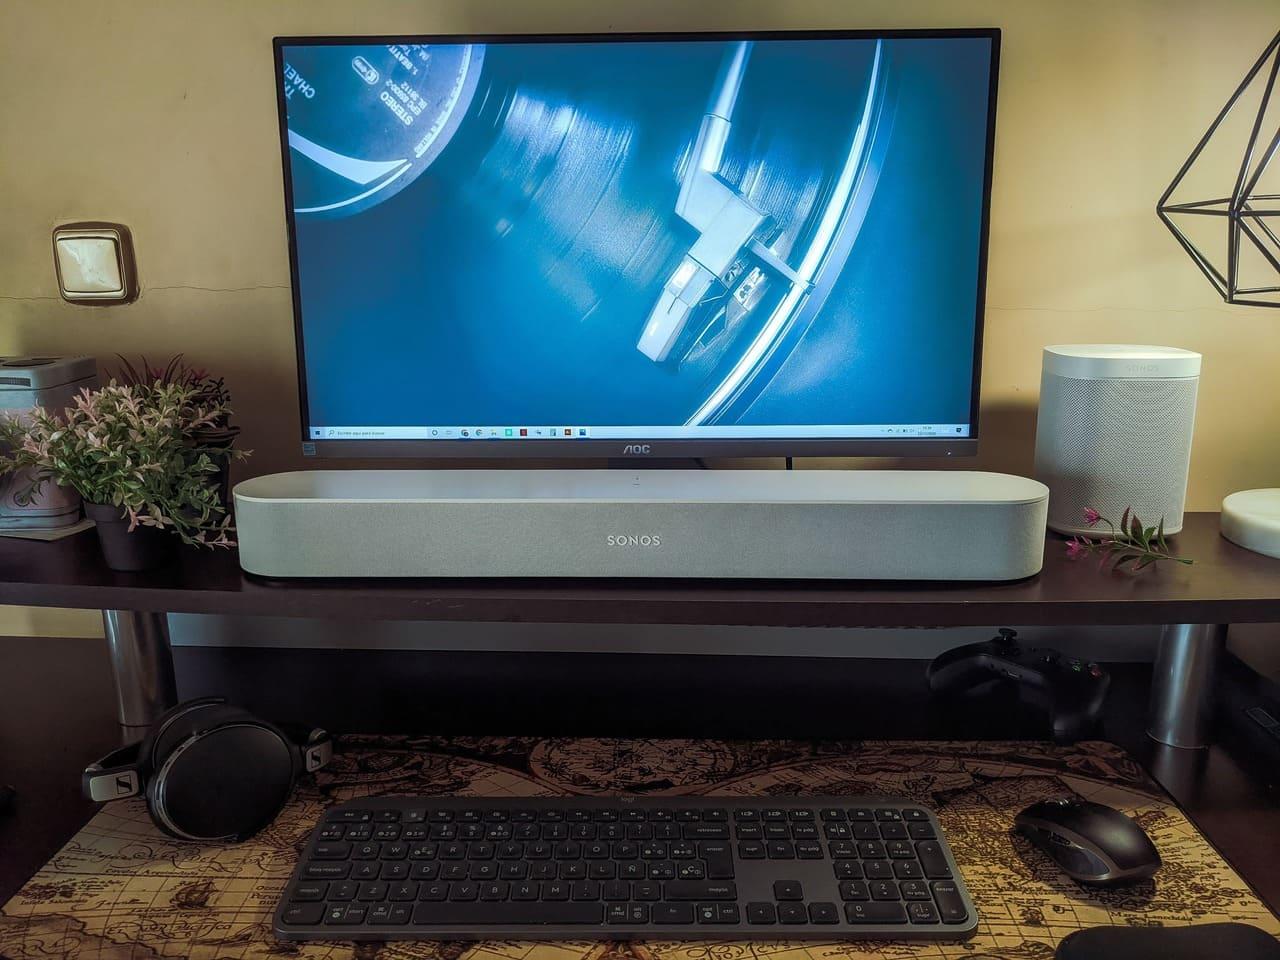 barra-de-sonido-sonos-beam-escritorio-zona-de-trabajo-teclado-logitech-mx-keys-raton-mx-anywhere-2-monitor-aoc-u2790pqu-altavoz-inteligente-sonos-one-disco-vinilo